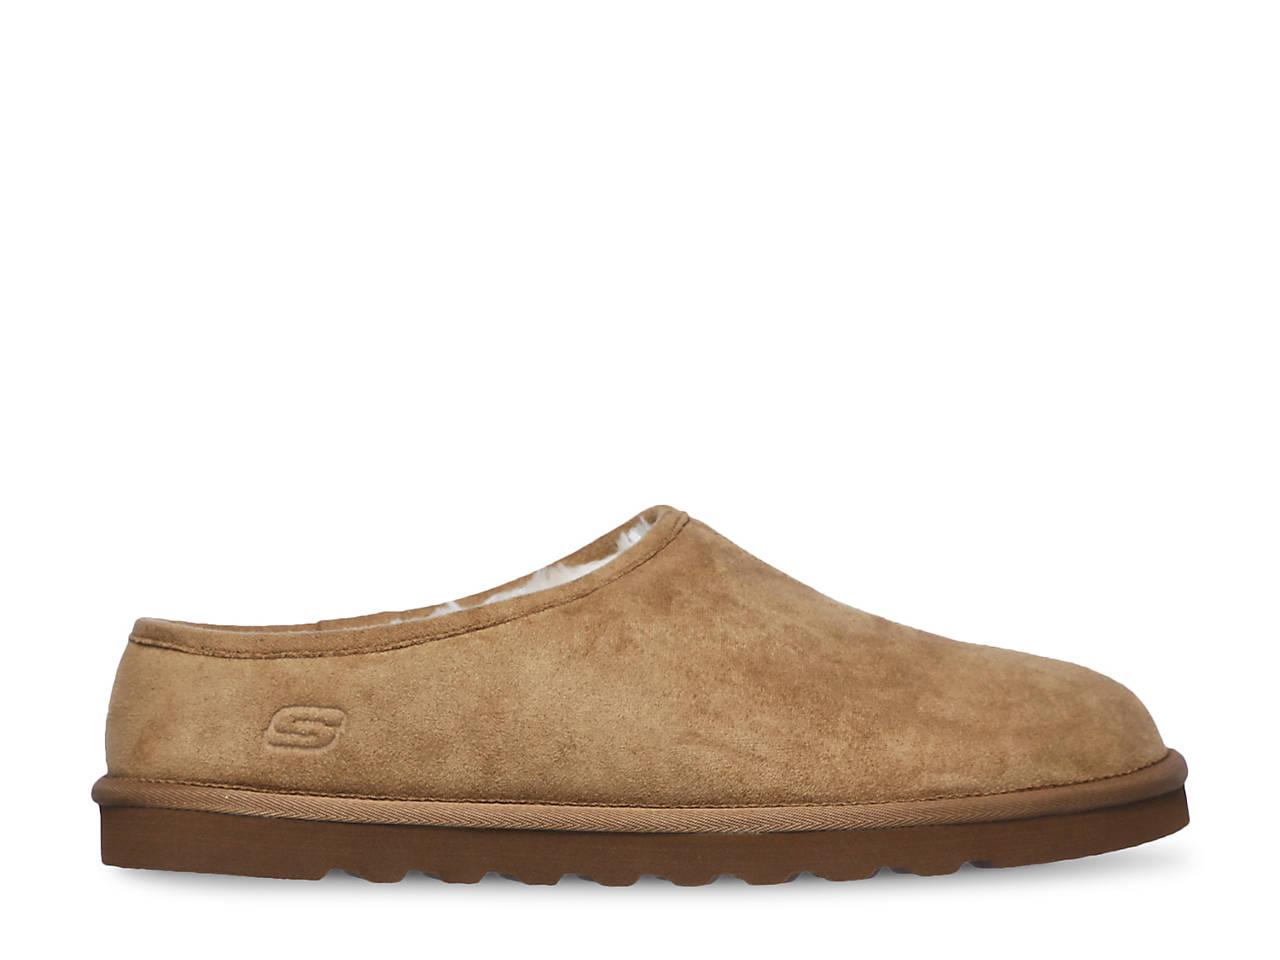 Shop Skechers Men's Relaxed Fit Renten Lemato Clog Slipper